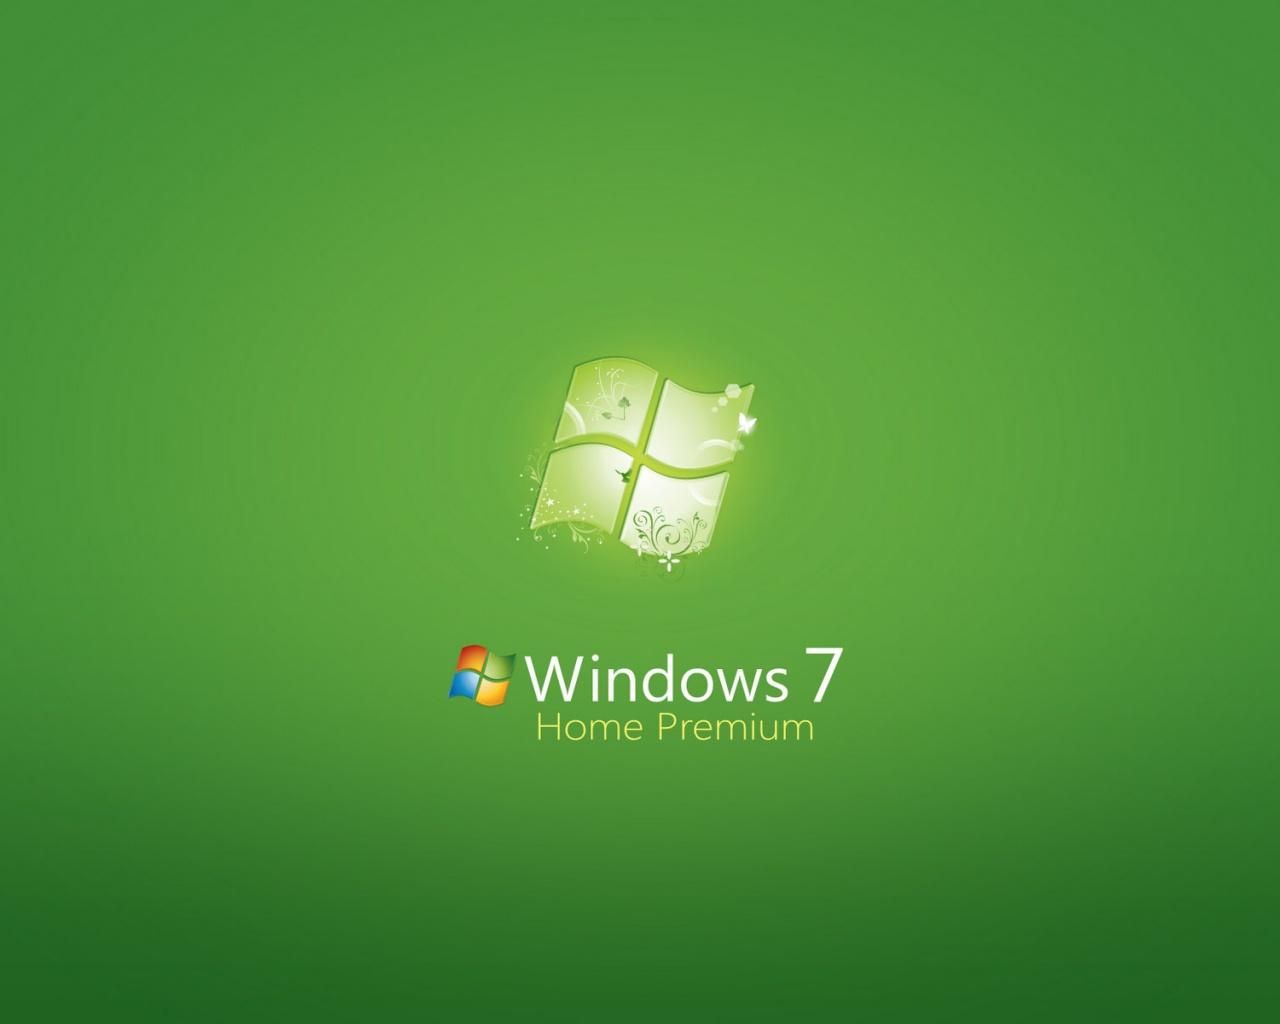 windows 7 papel de parede